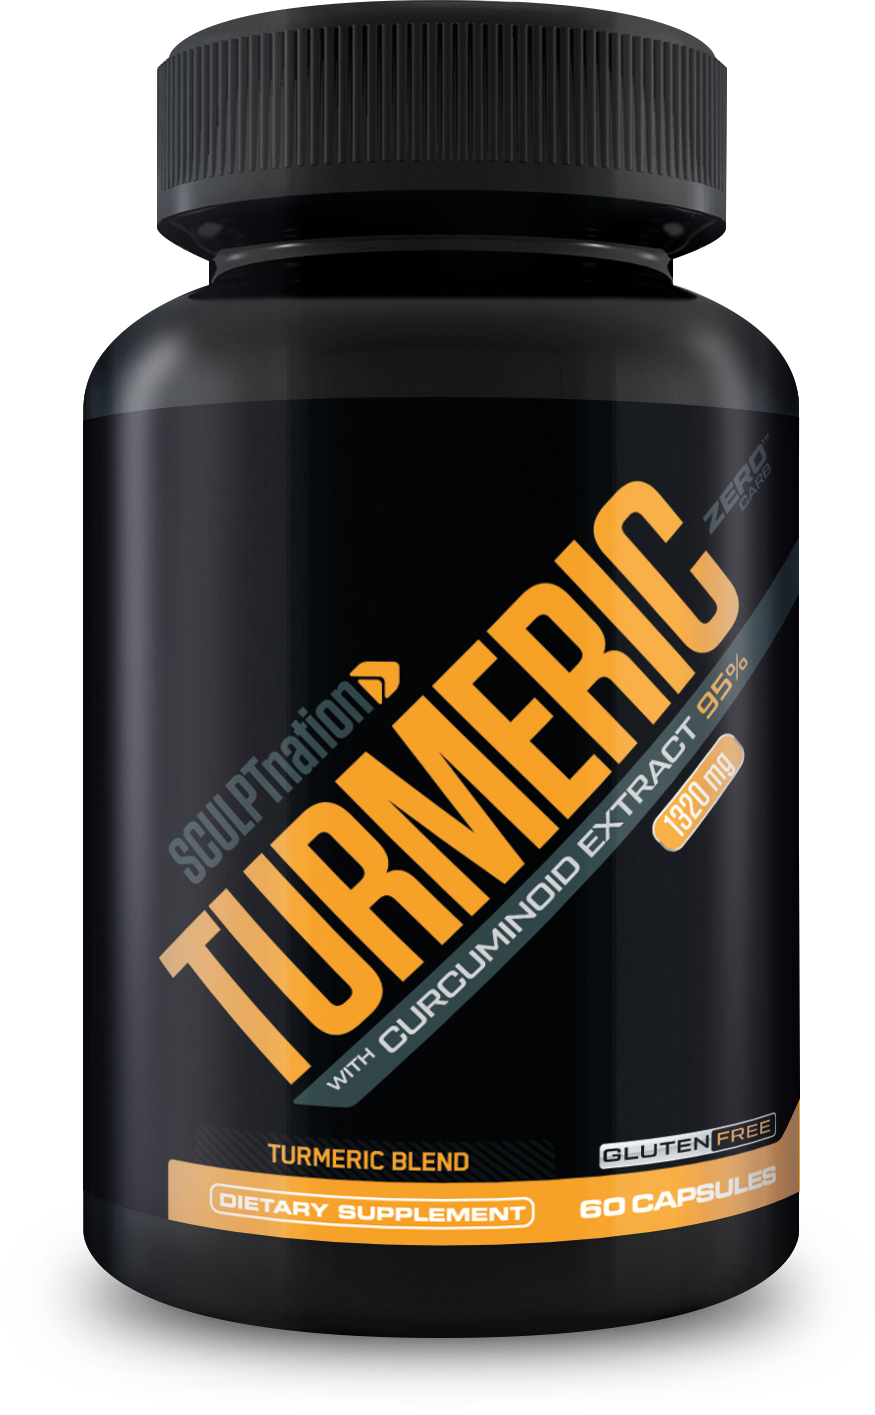 turmeric black